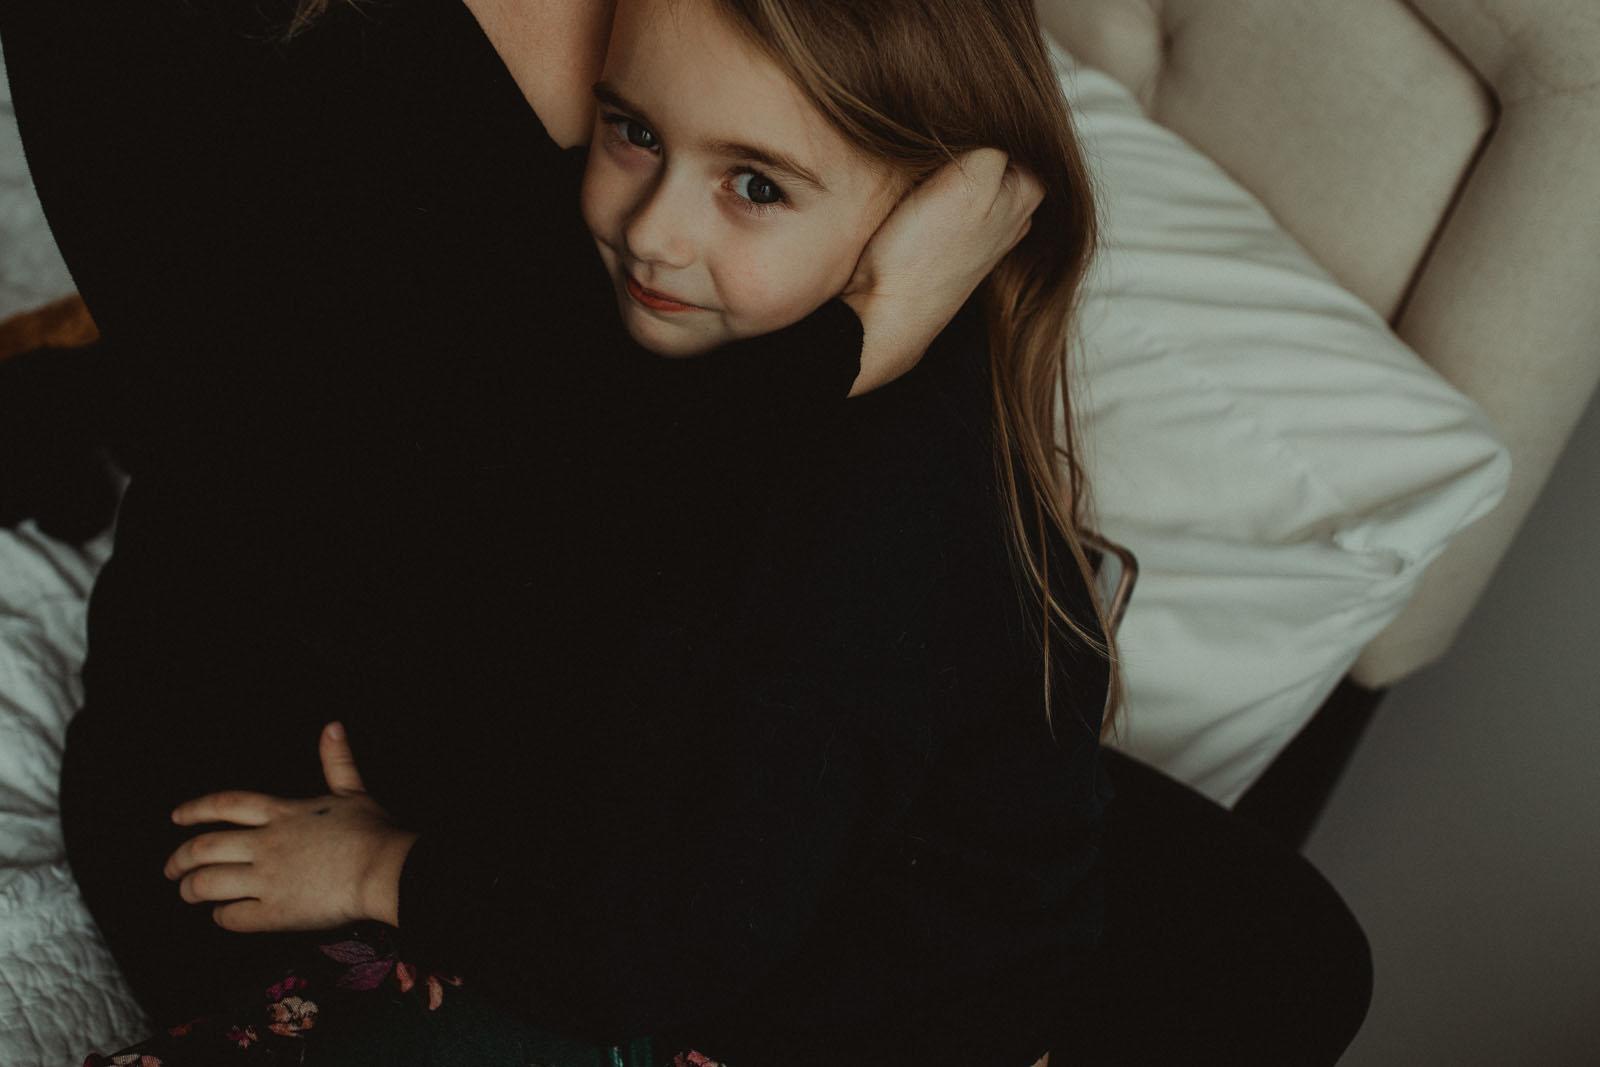 Mom hugging child. Finding balance with photography and motherhood